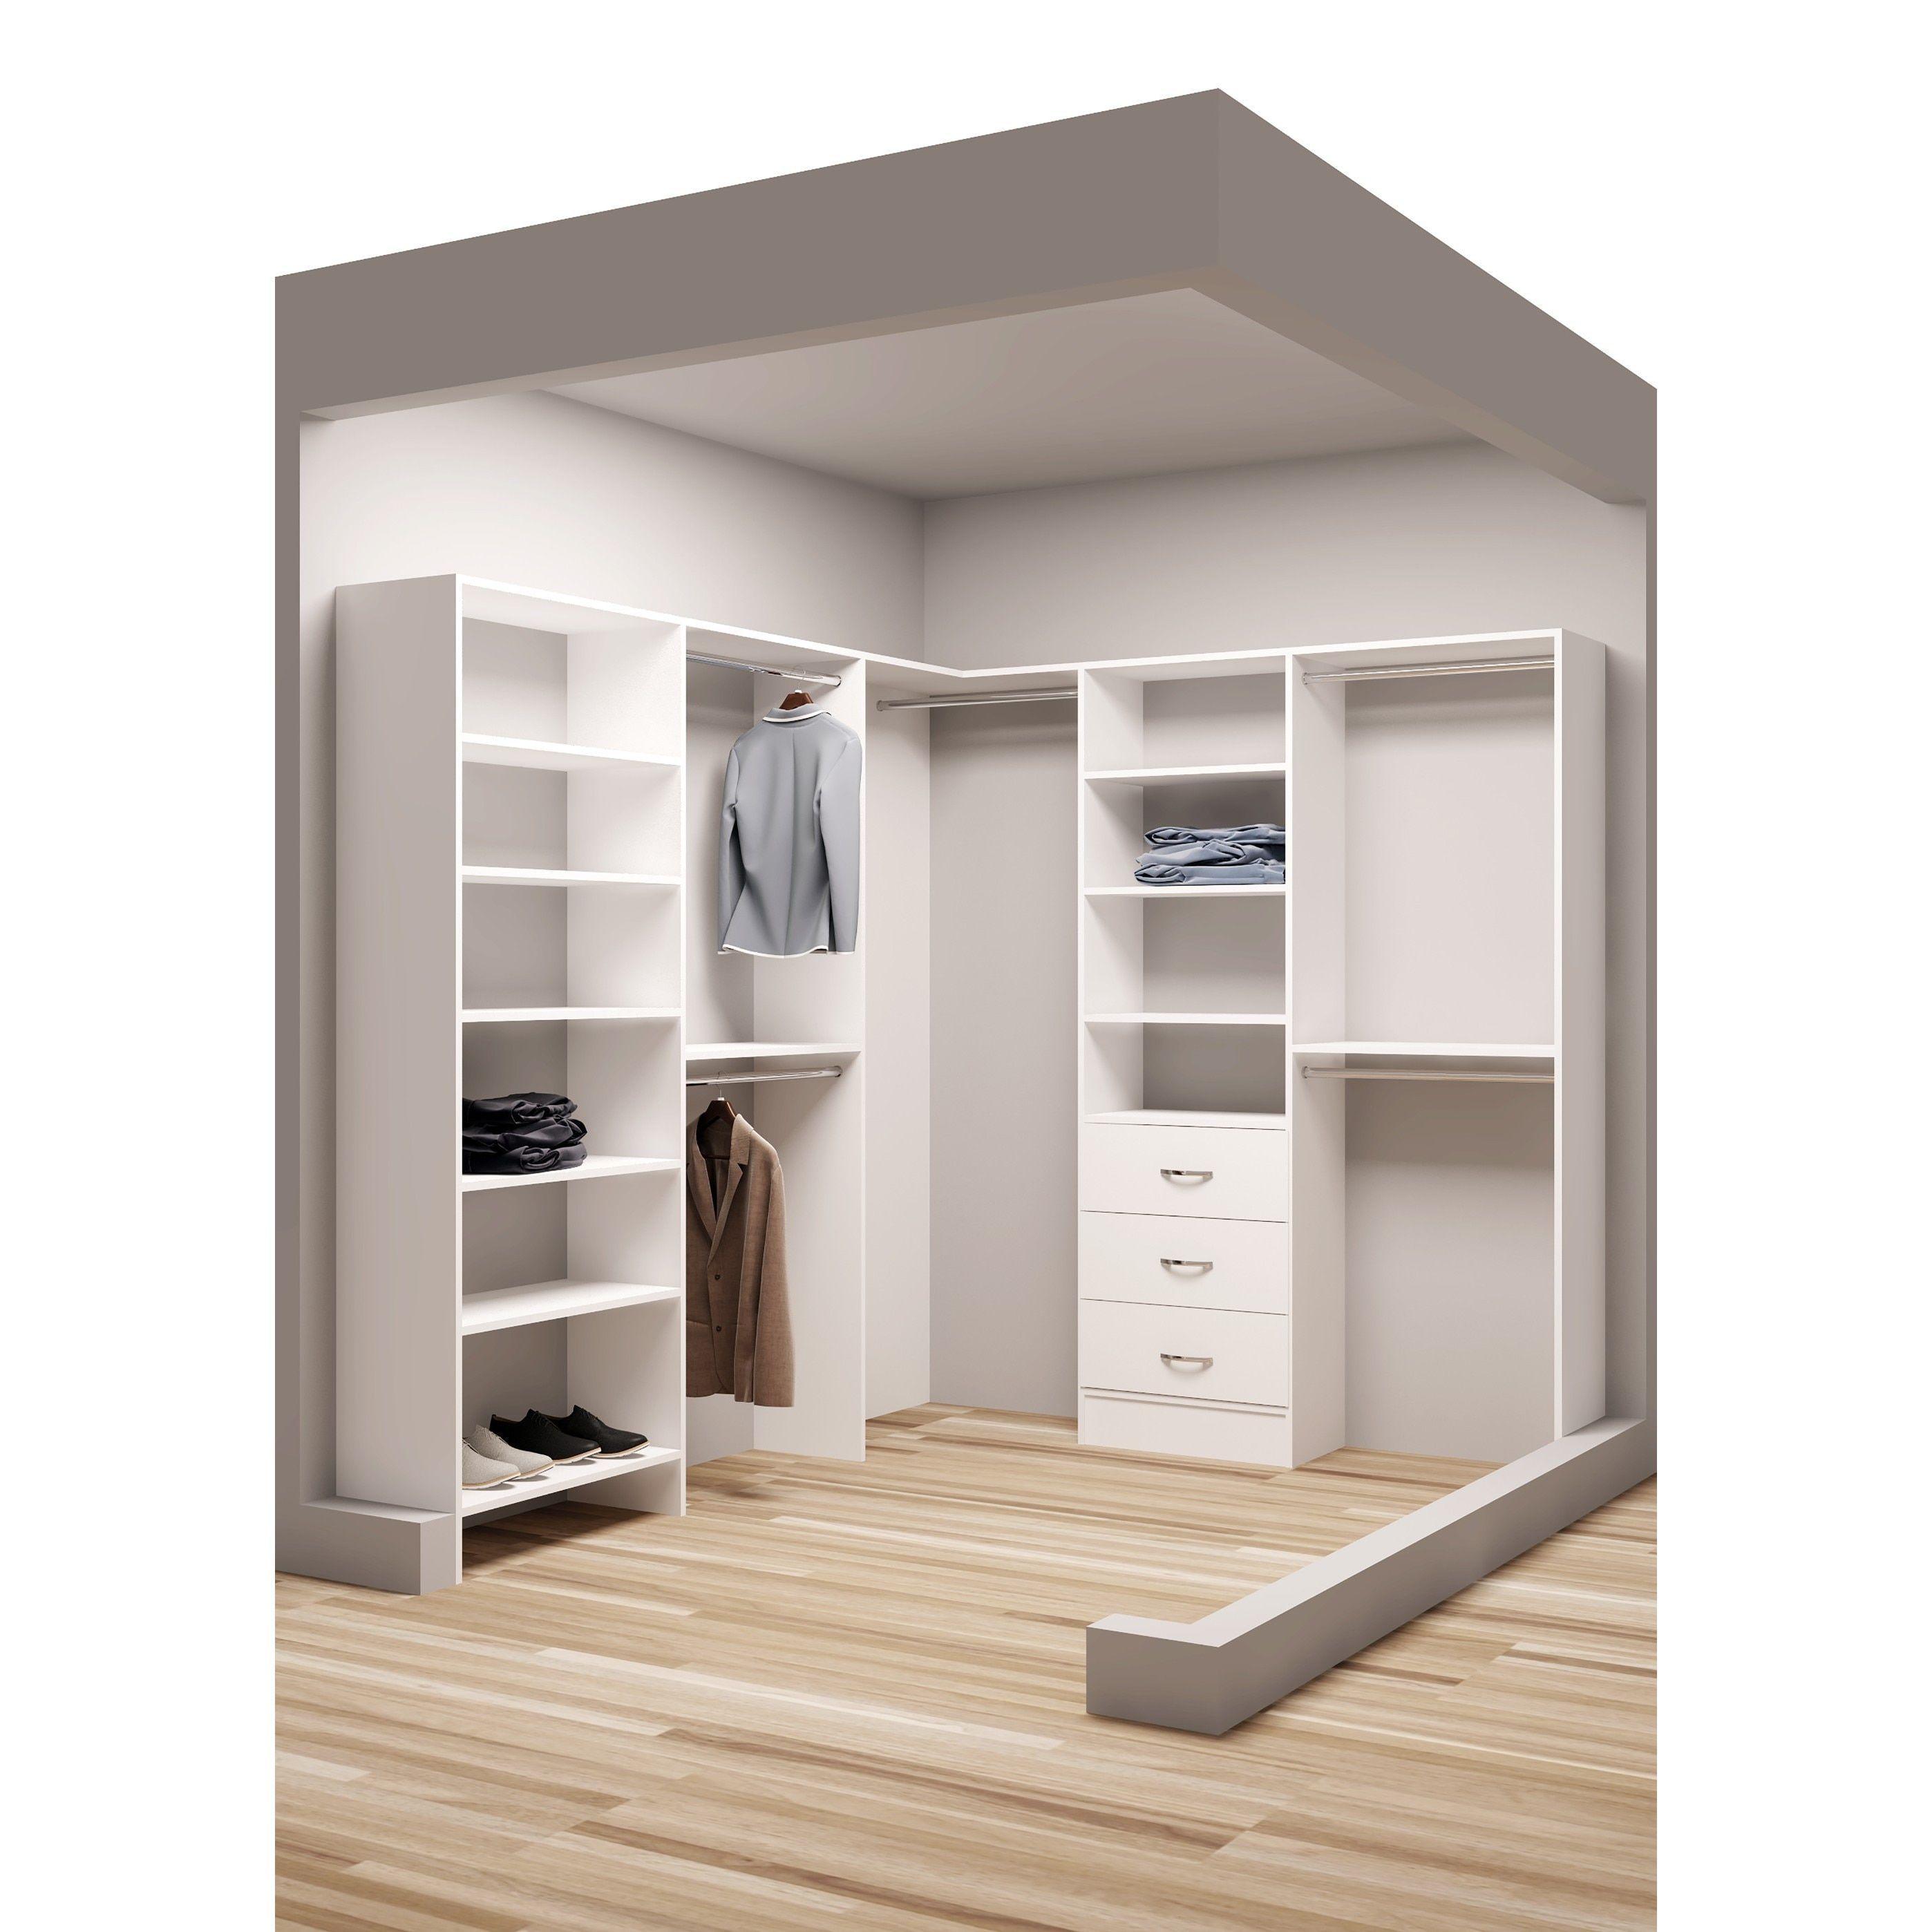 Tidysquares White Wood 81 X 96 25 Walk In Closet System White